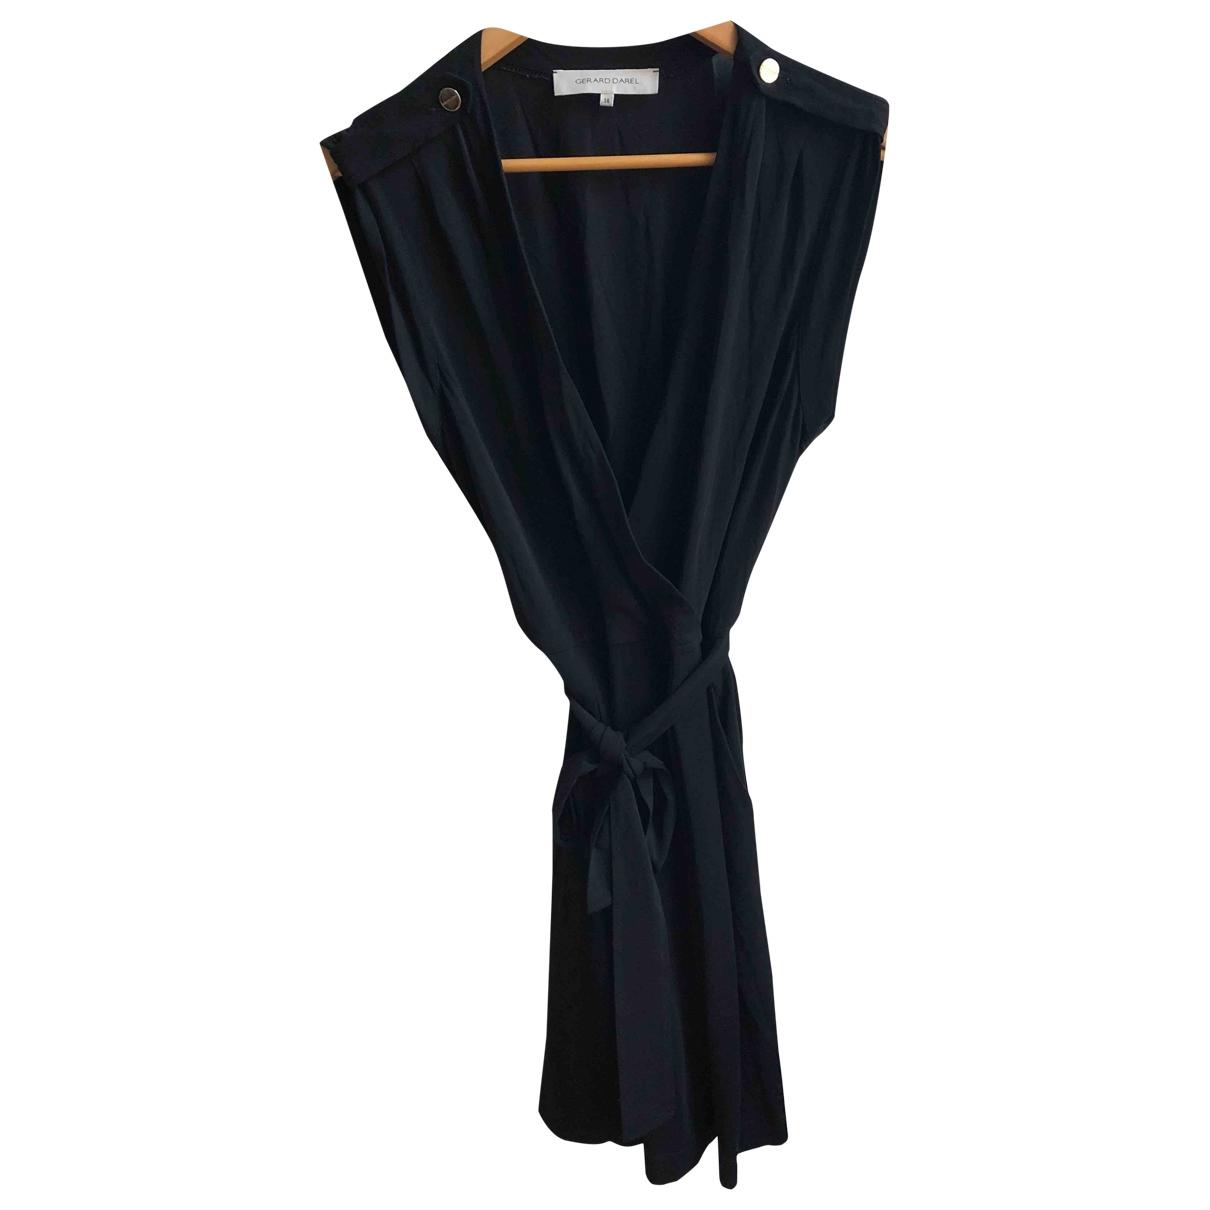 Gerard Darel \N Black dress for Women 38 FR